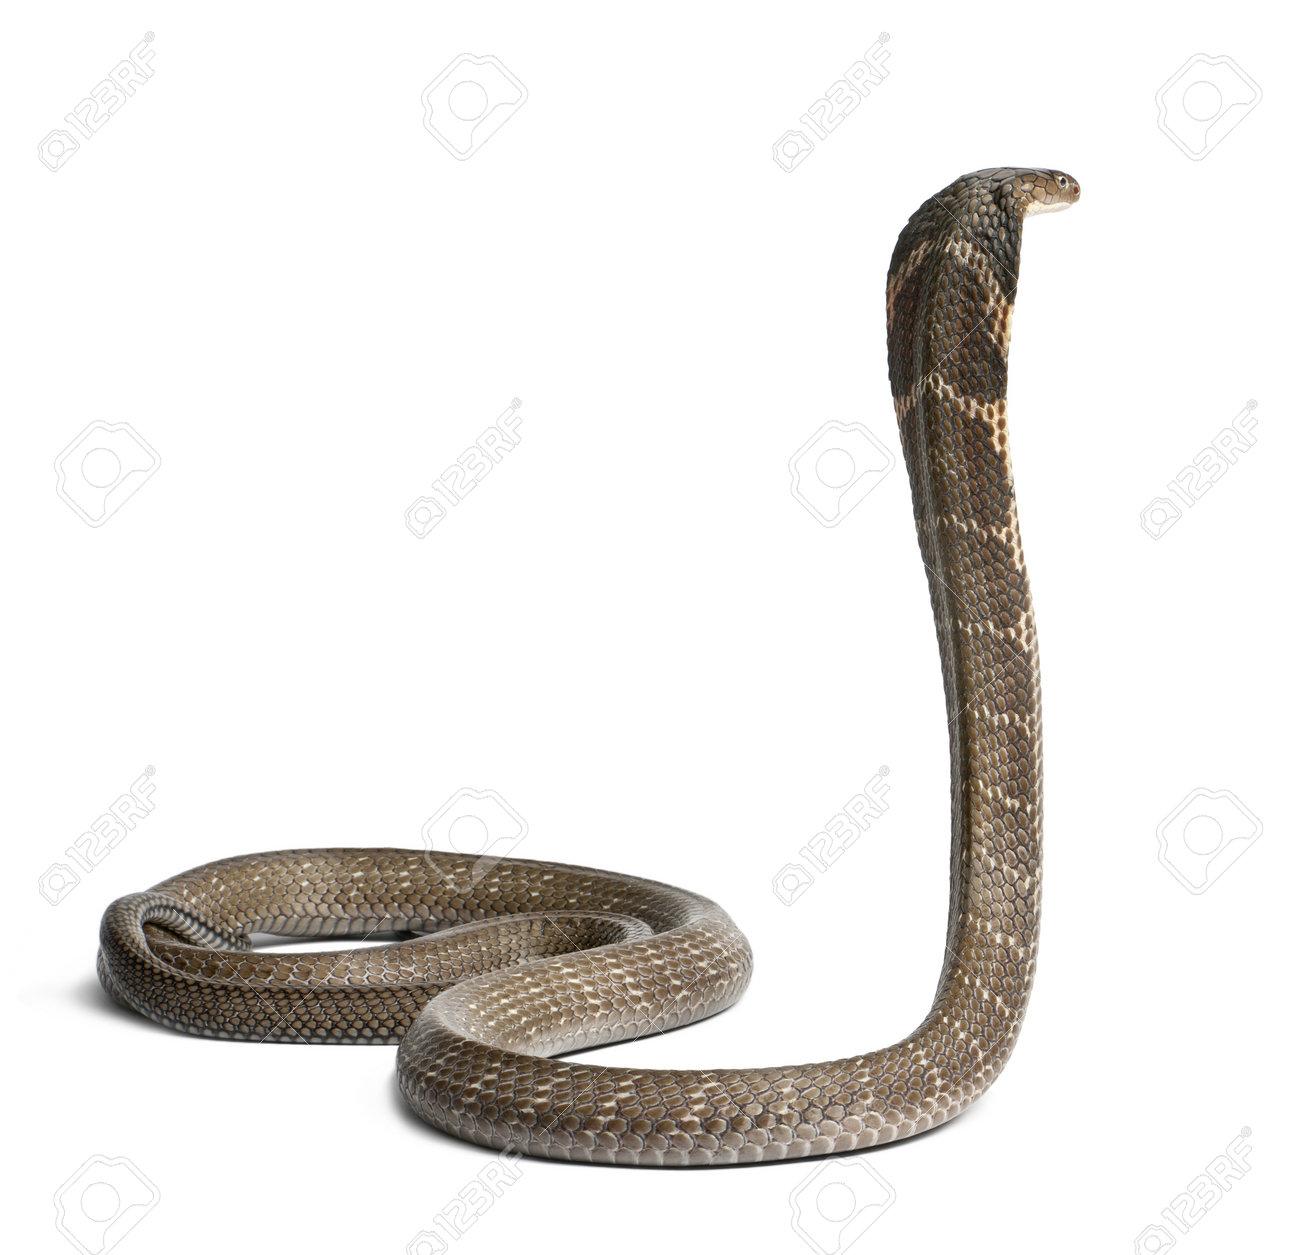 king cobra - Ophiophagus hannah, poisonous, white background Stock Photo - 13582625